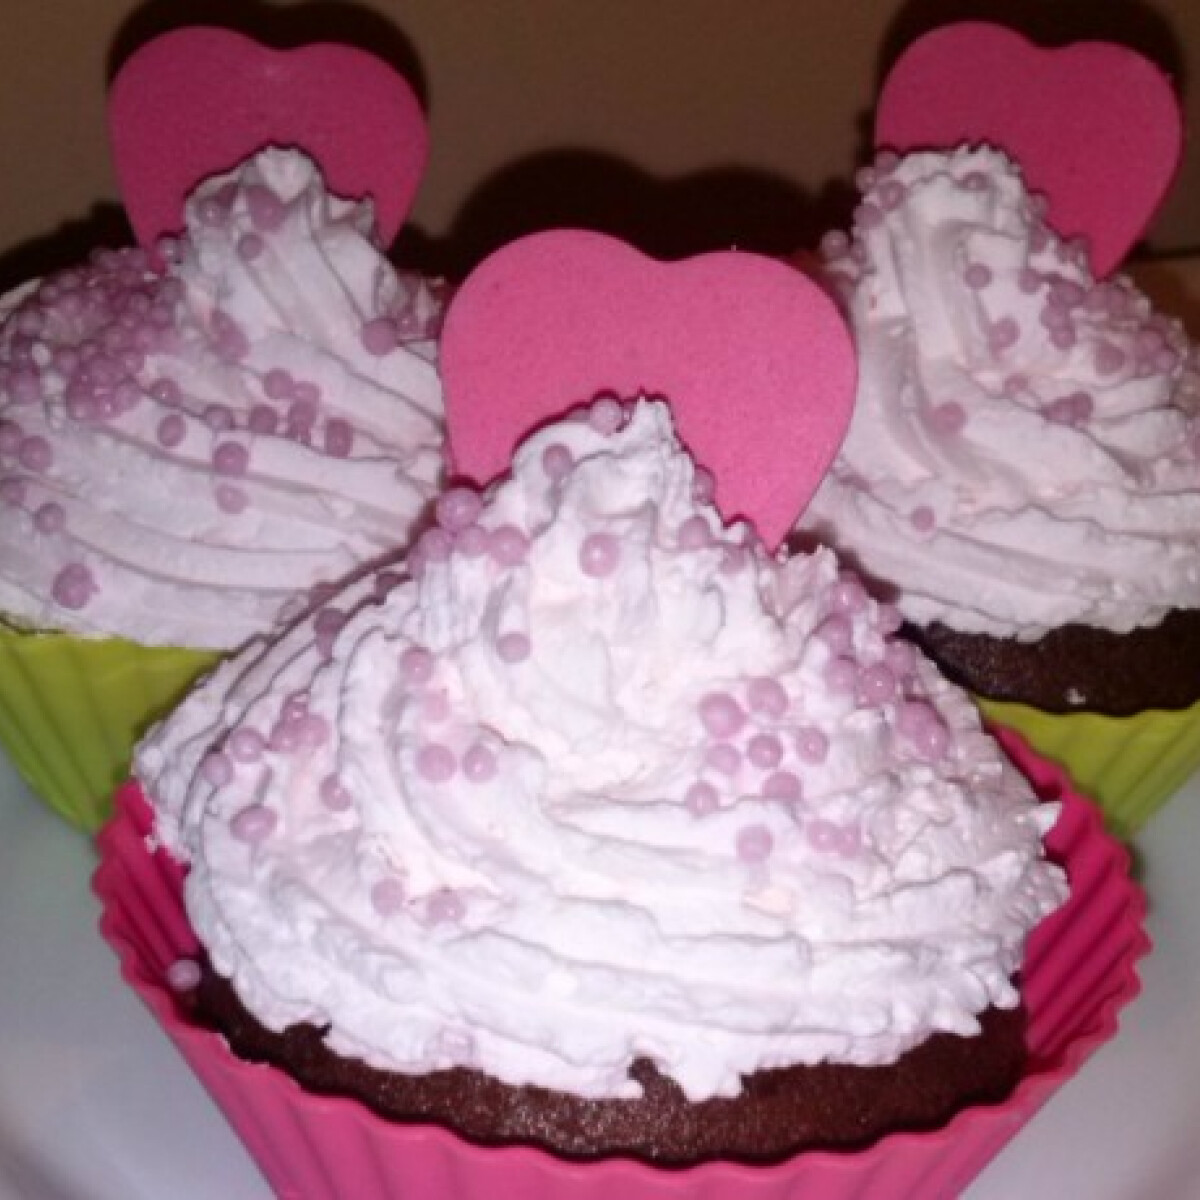 Ezen a képen: Valentin-napi cupcake